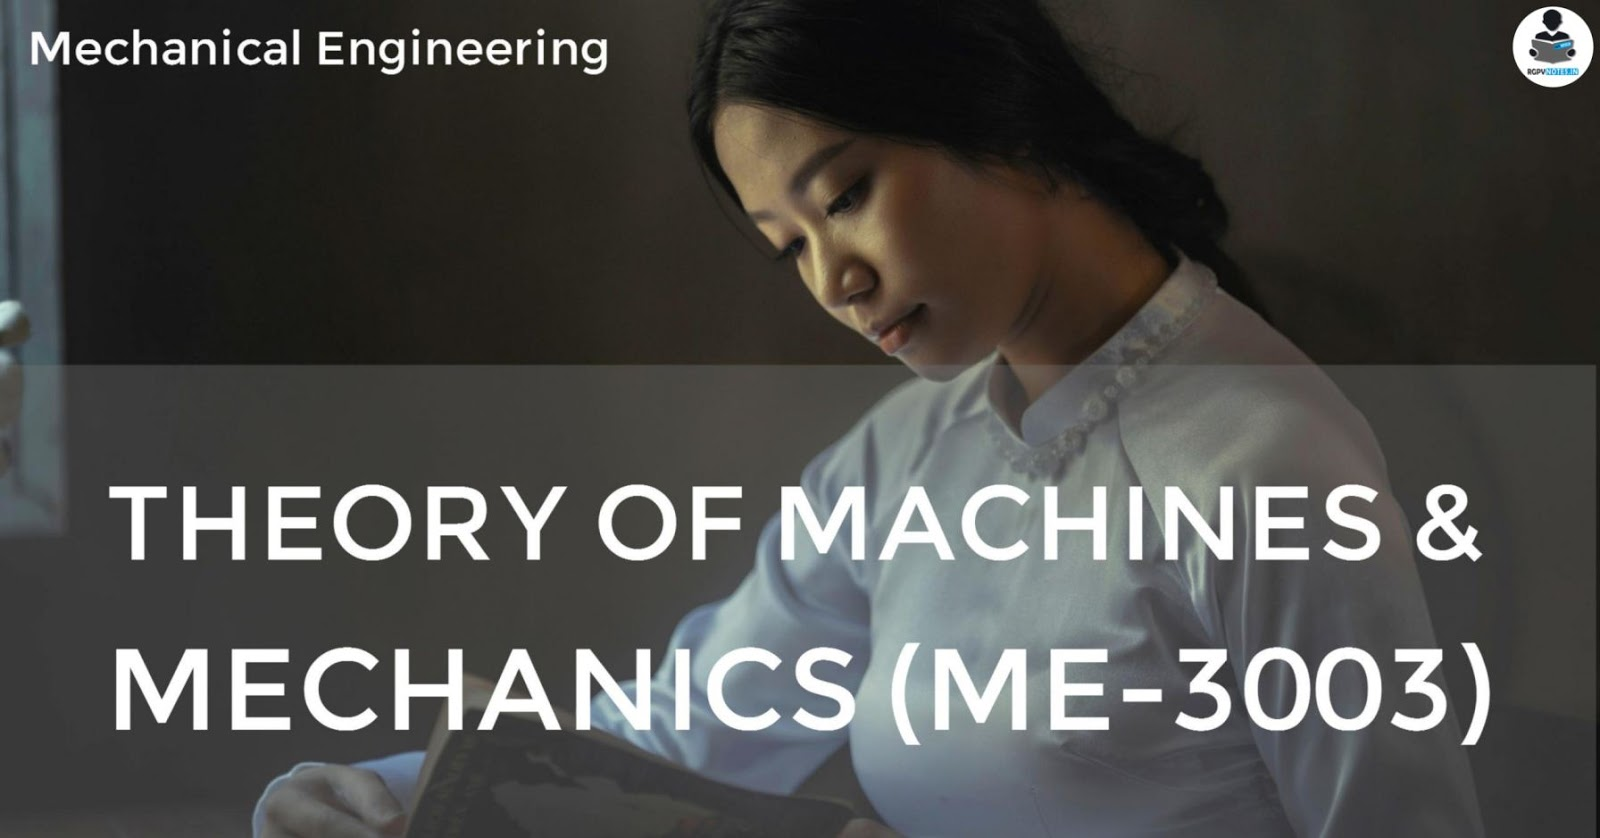 ME3003 - Theory of machines & mechanics - RGPV notes CBGS